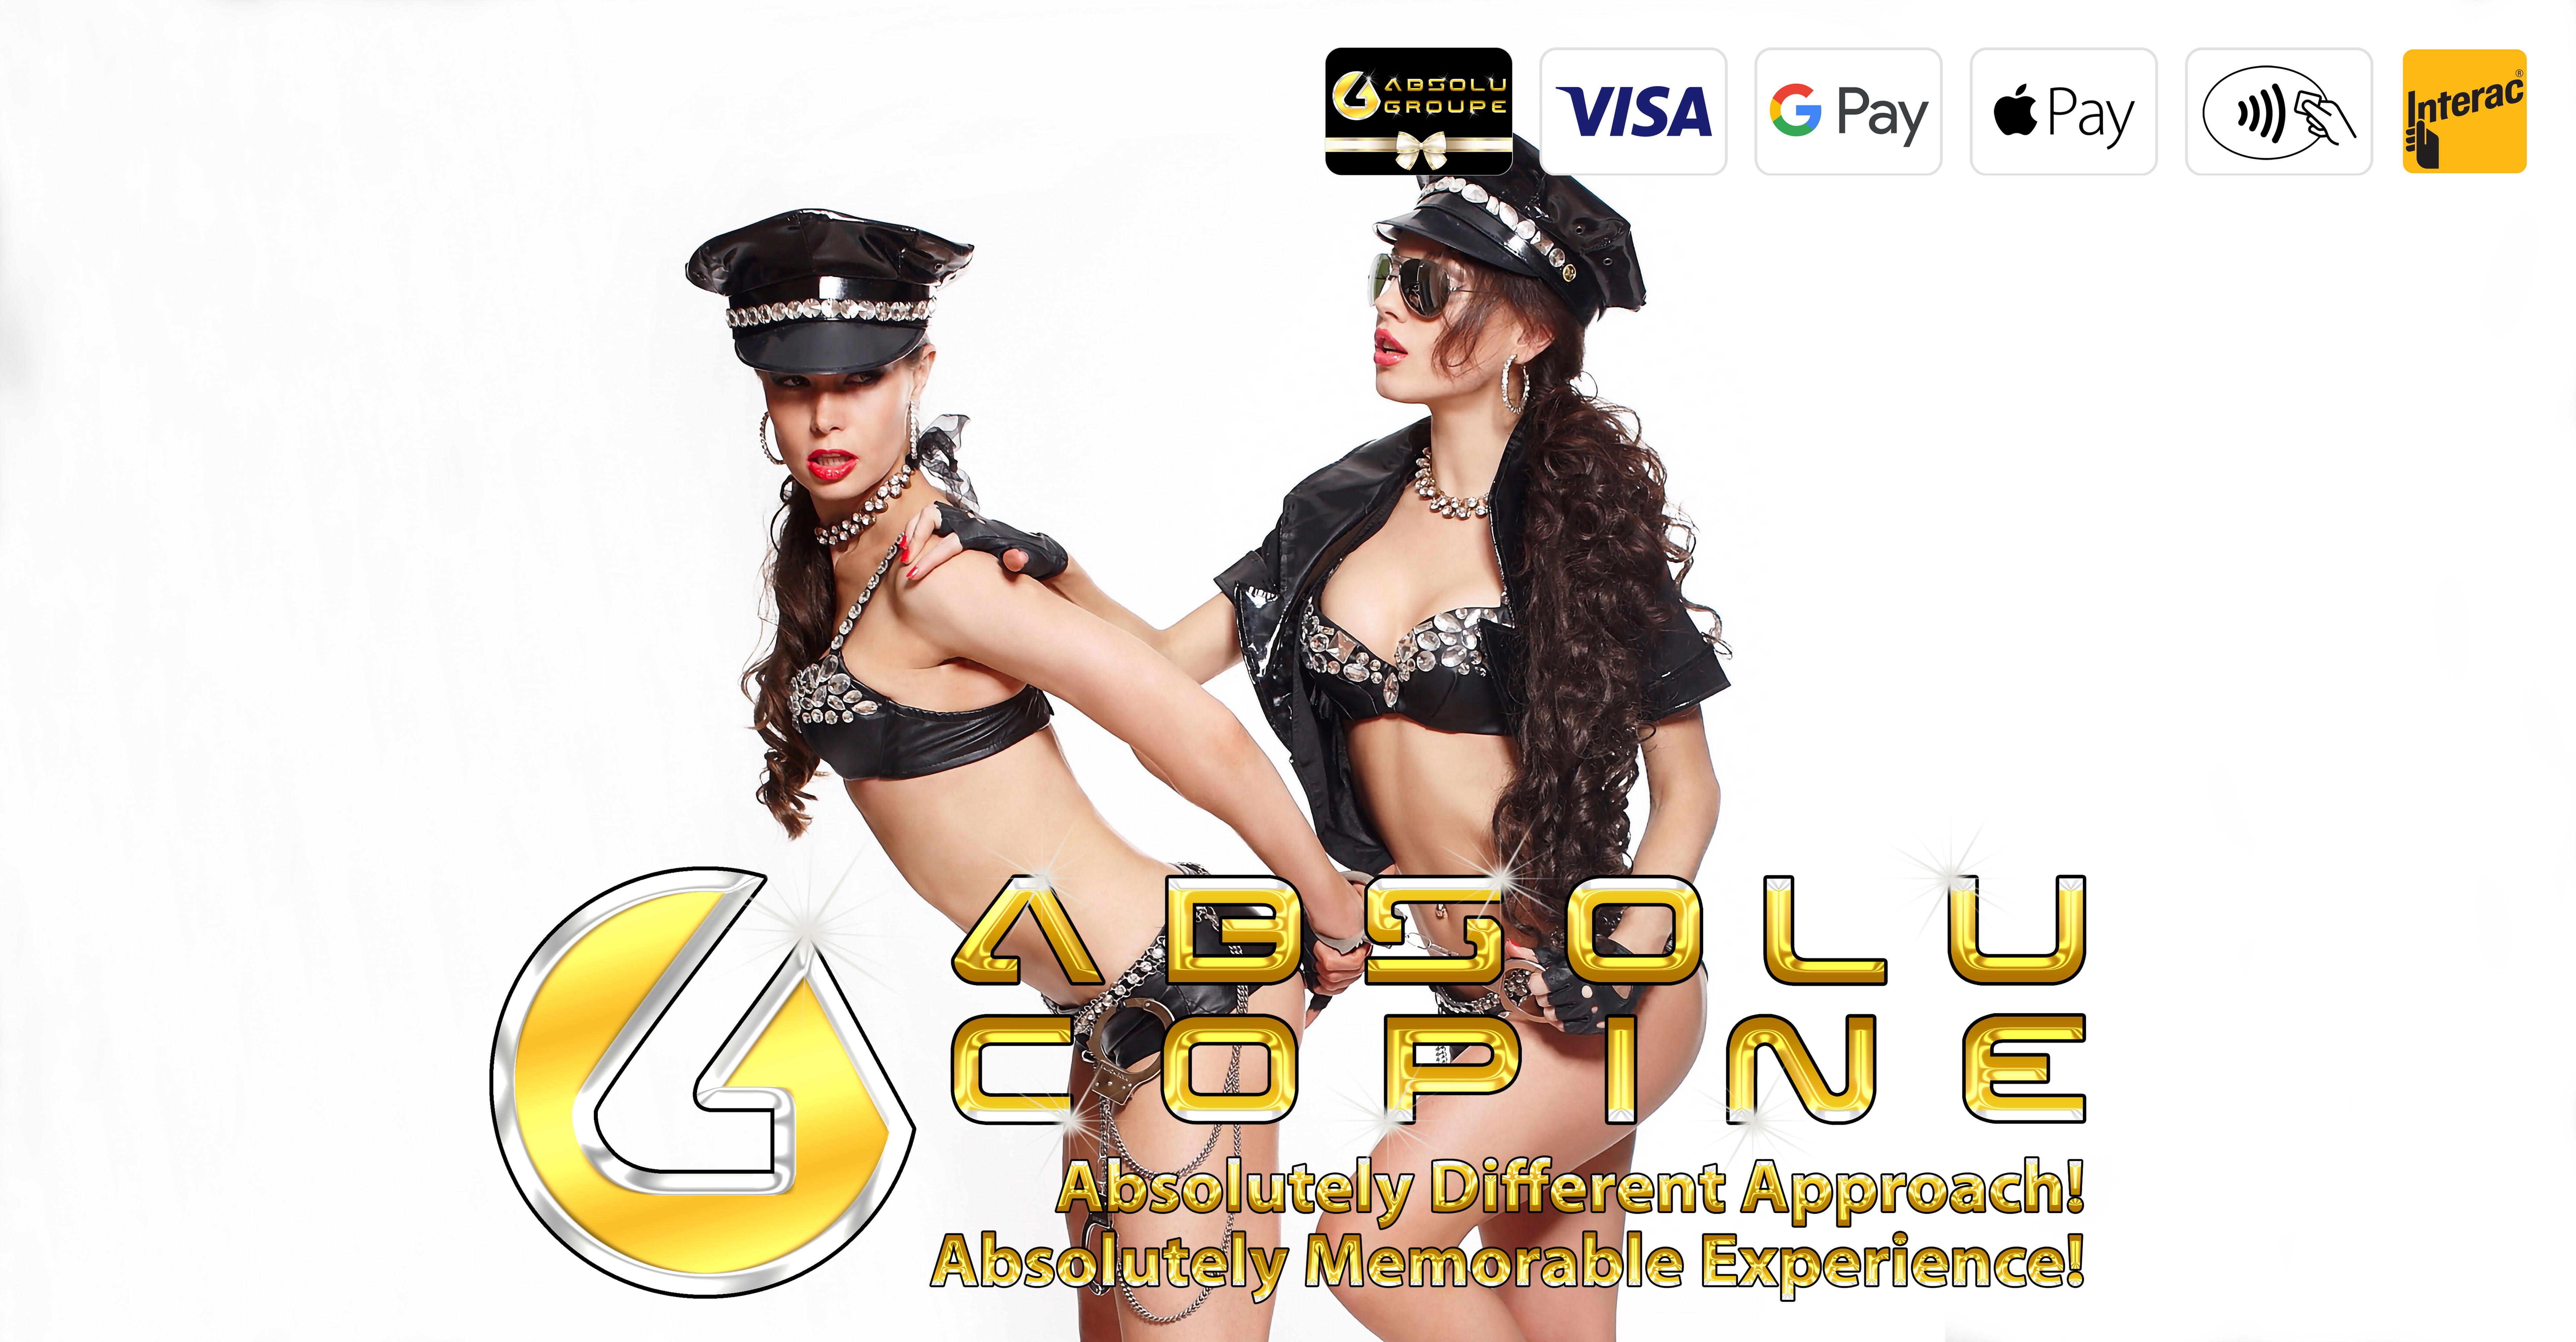 Security-Confidentiality-Absolu-Copine-Escorts-Montreal-EN-8K